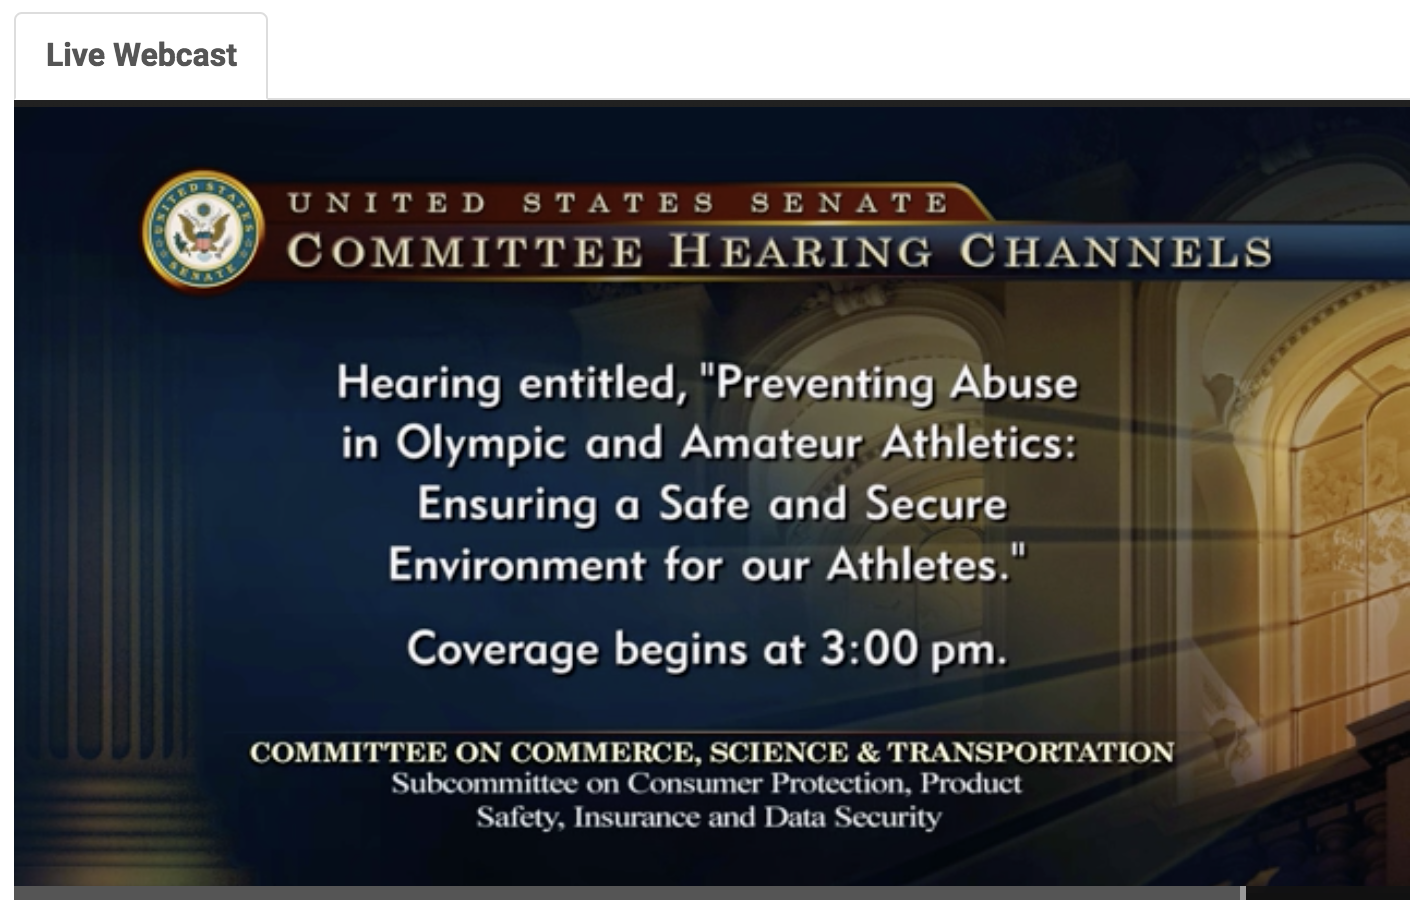 WATCH LIVE: Steve Penny & Rhonda Faehn Testify before Congress